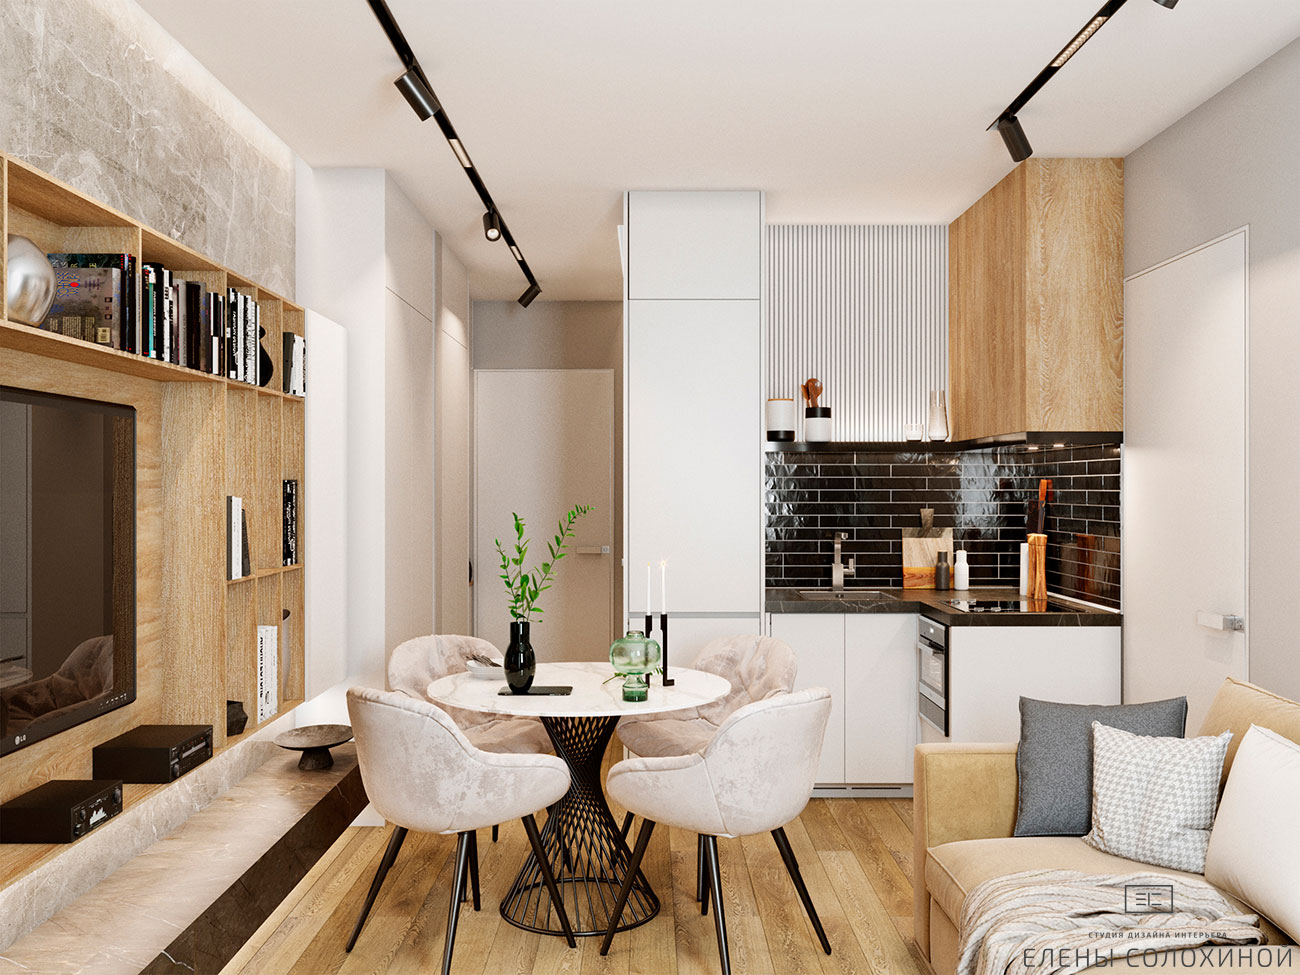 Дизайн квартиры с элементами лофта